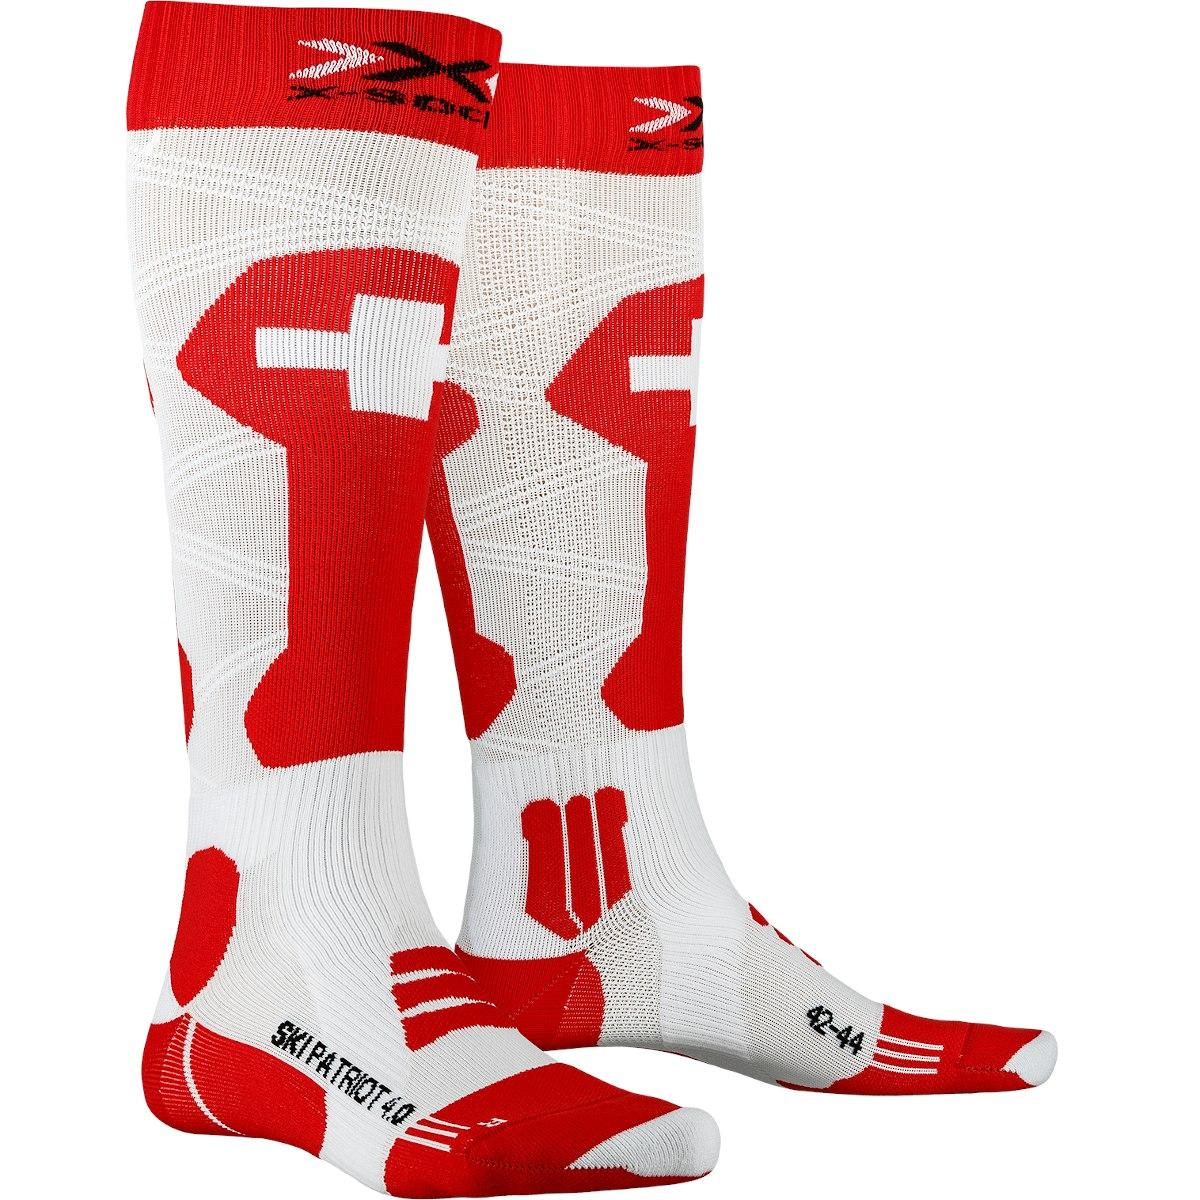 X-Socks Ski Patriot 4.0 Socken - switzerland